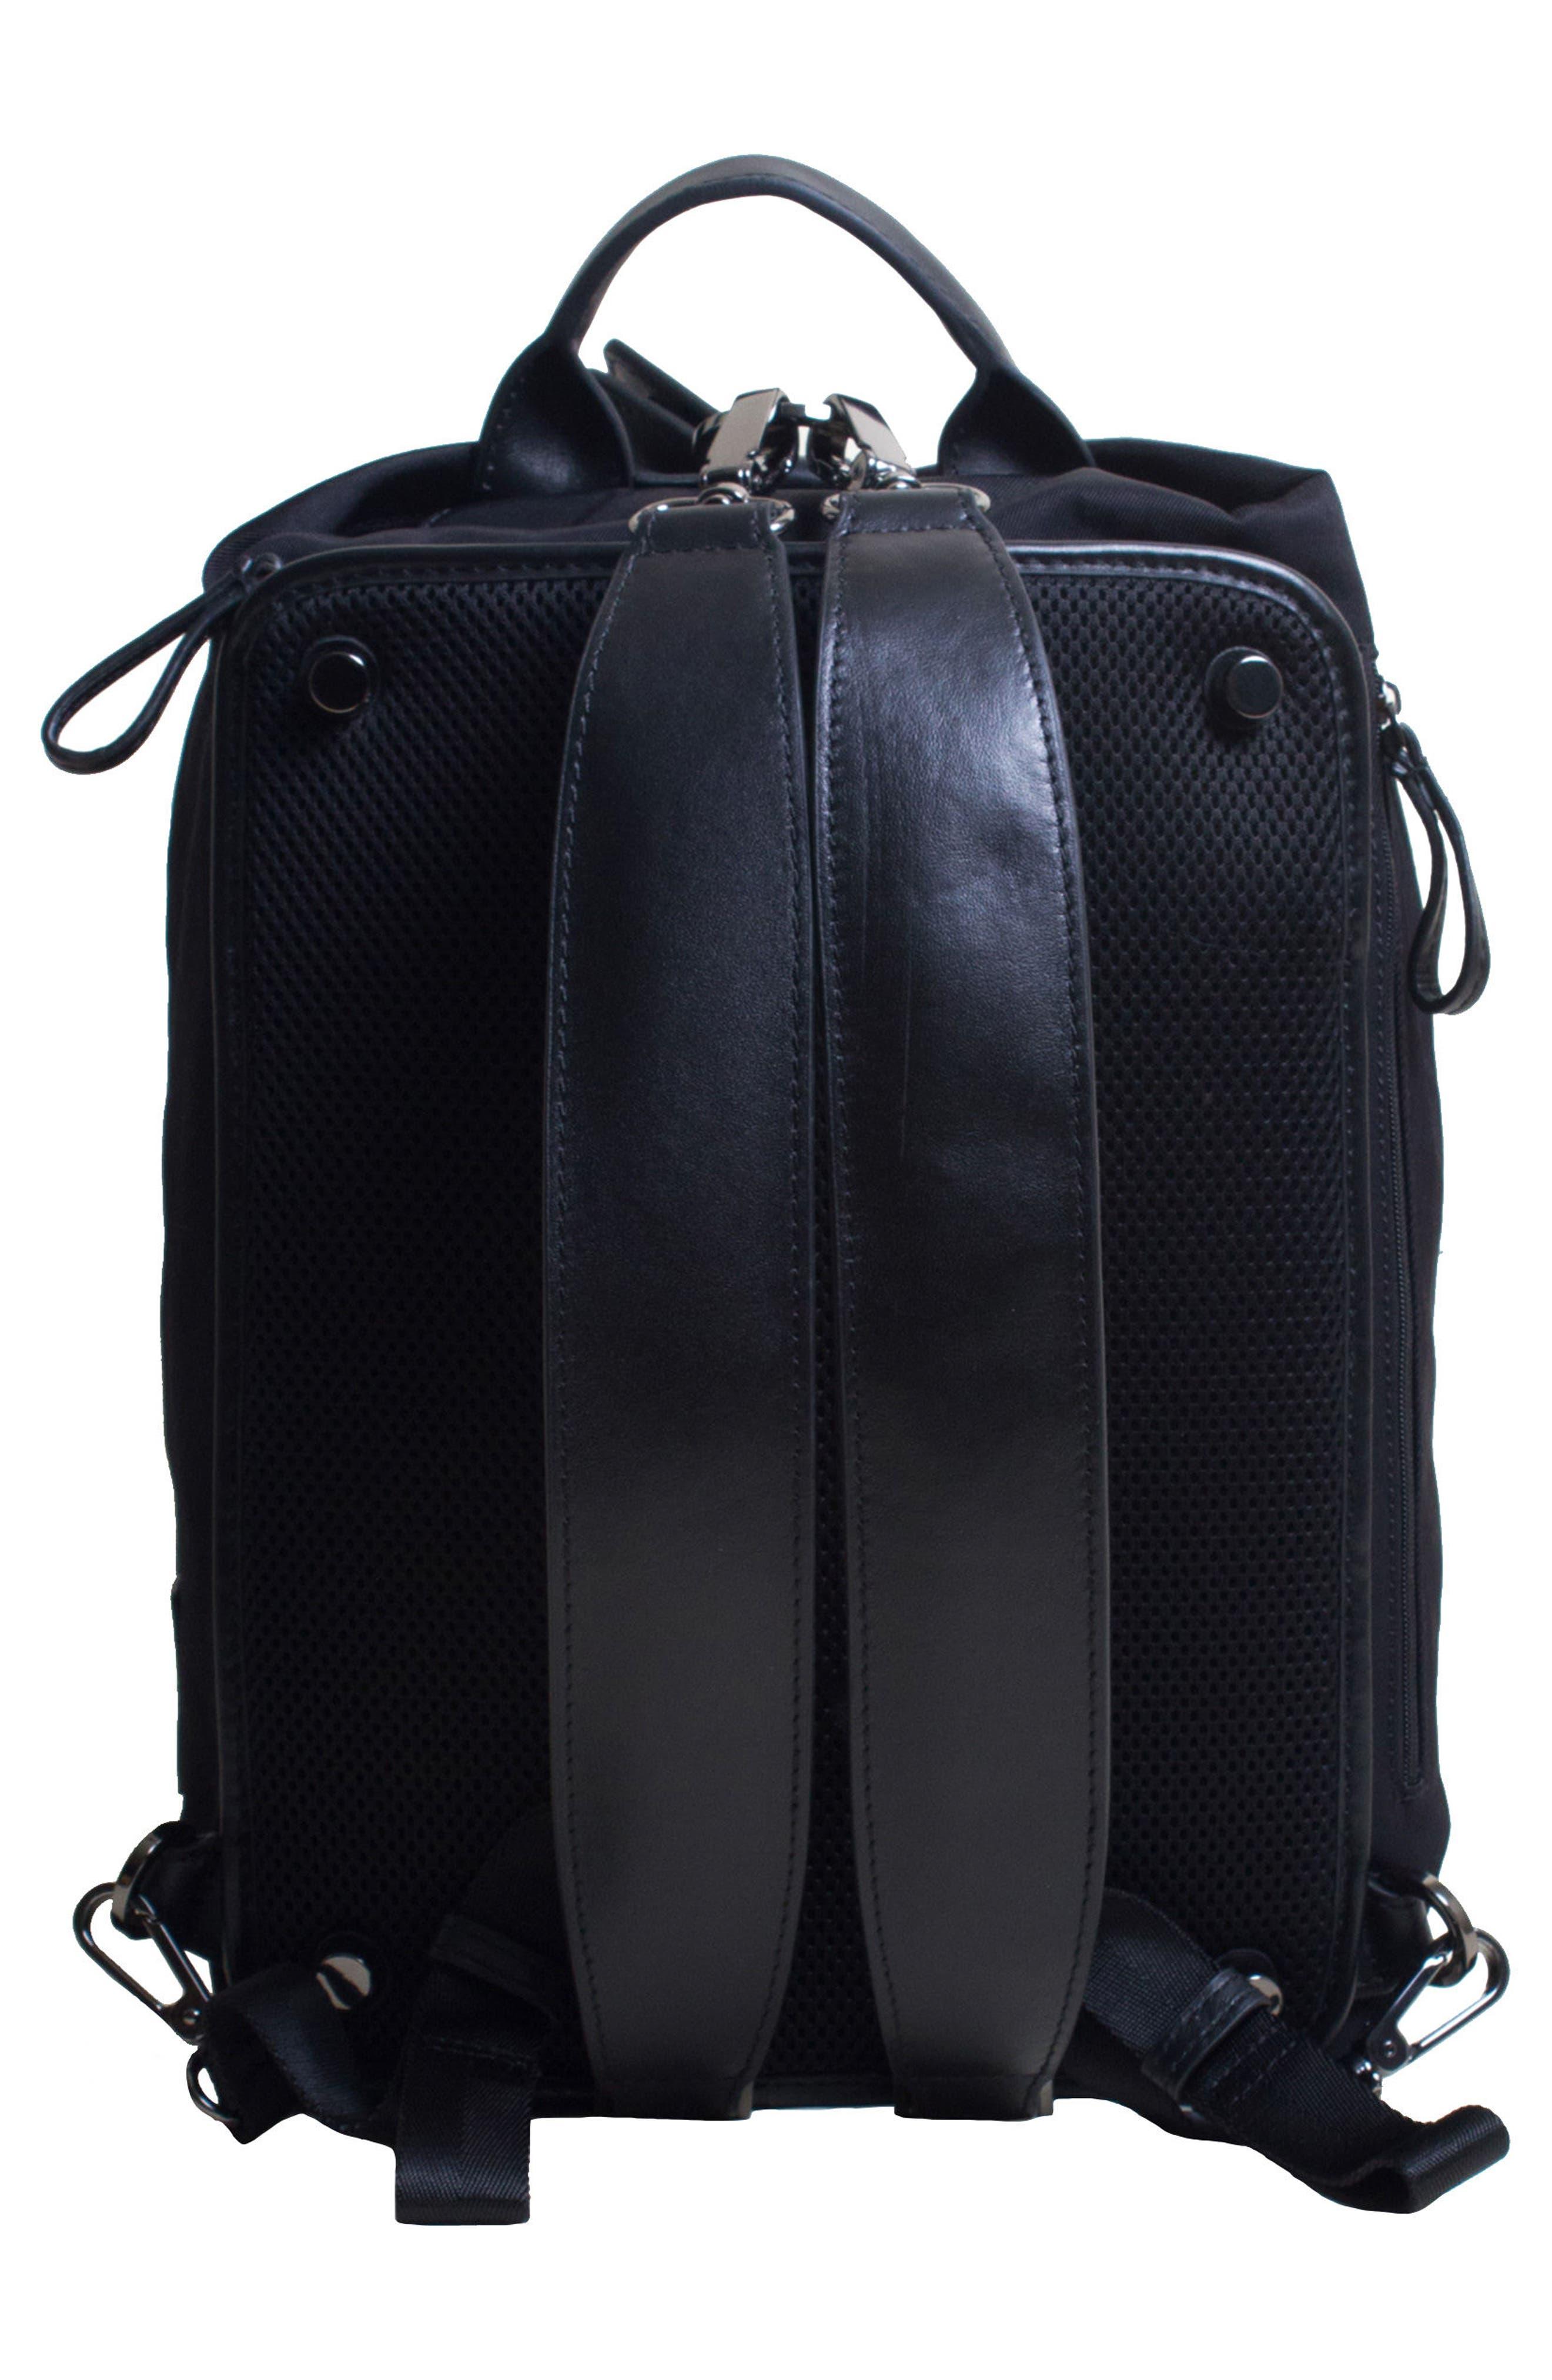 Studio Medium Duffel Backpack,                             Alternate thumbnail 3, color,                             001